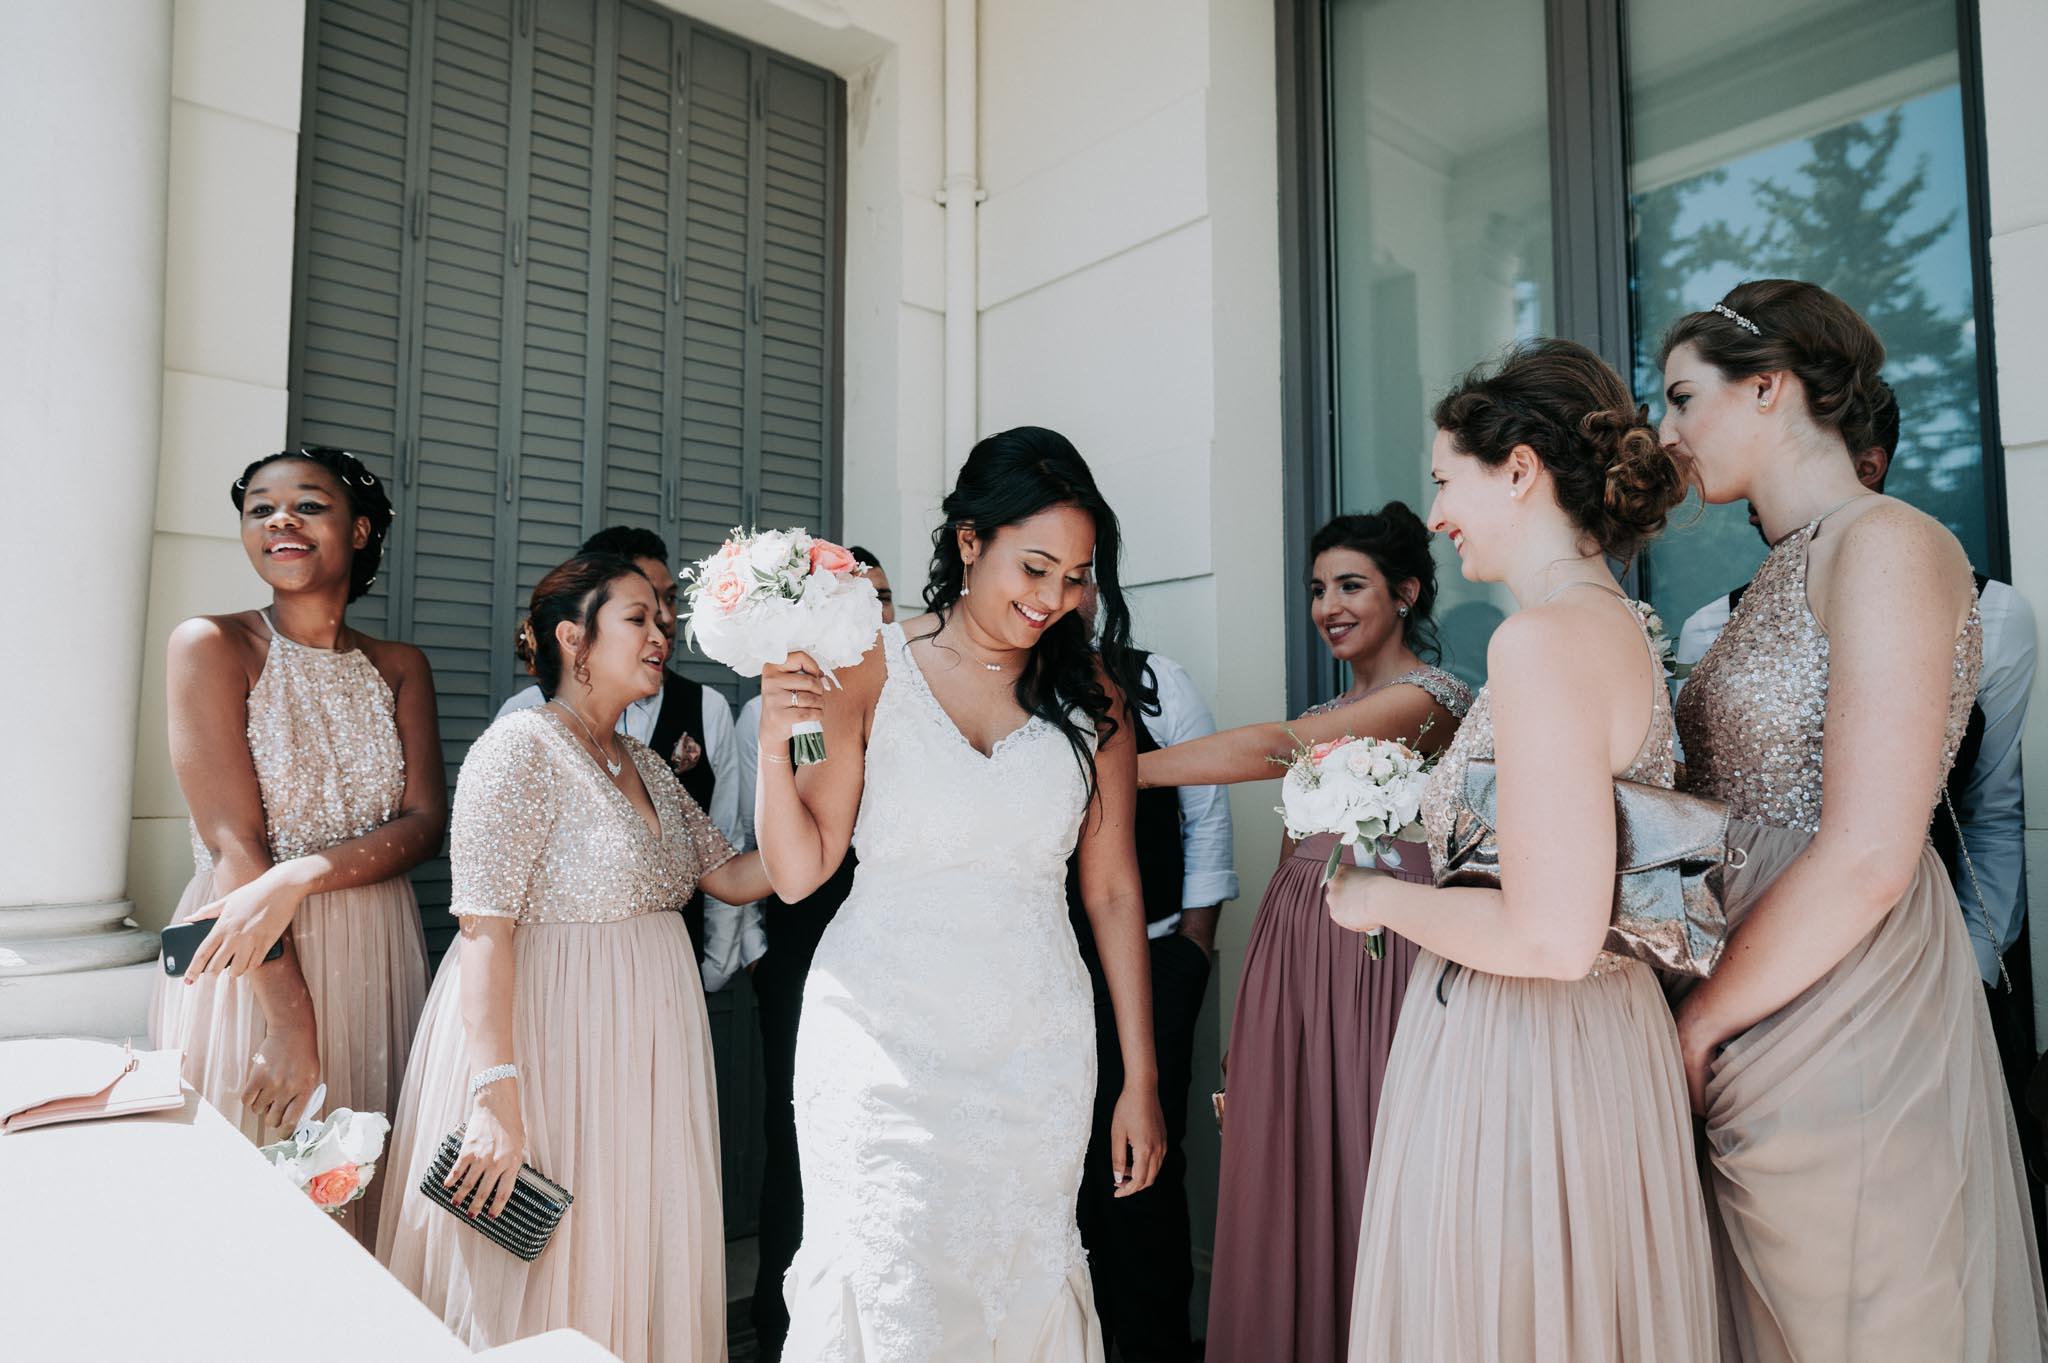 2017-07-15 - DSC_7658 - photographe - mariage - www.lauriediazwedding.com.jpg